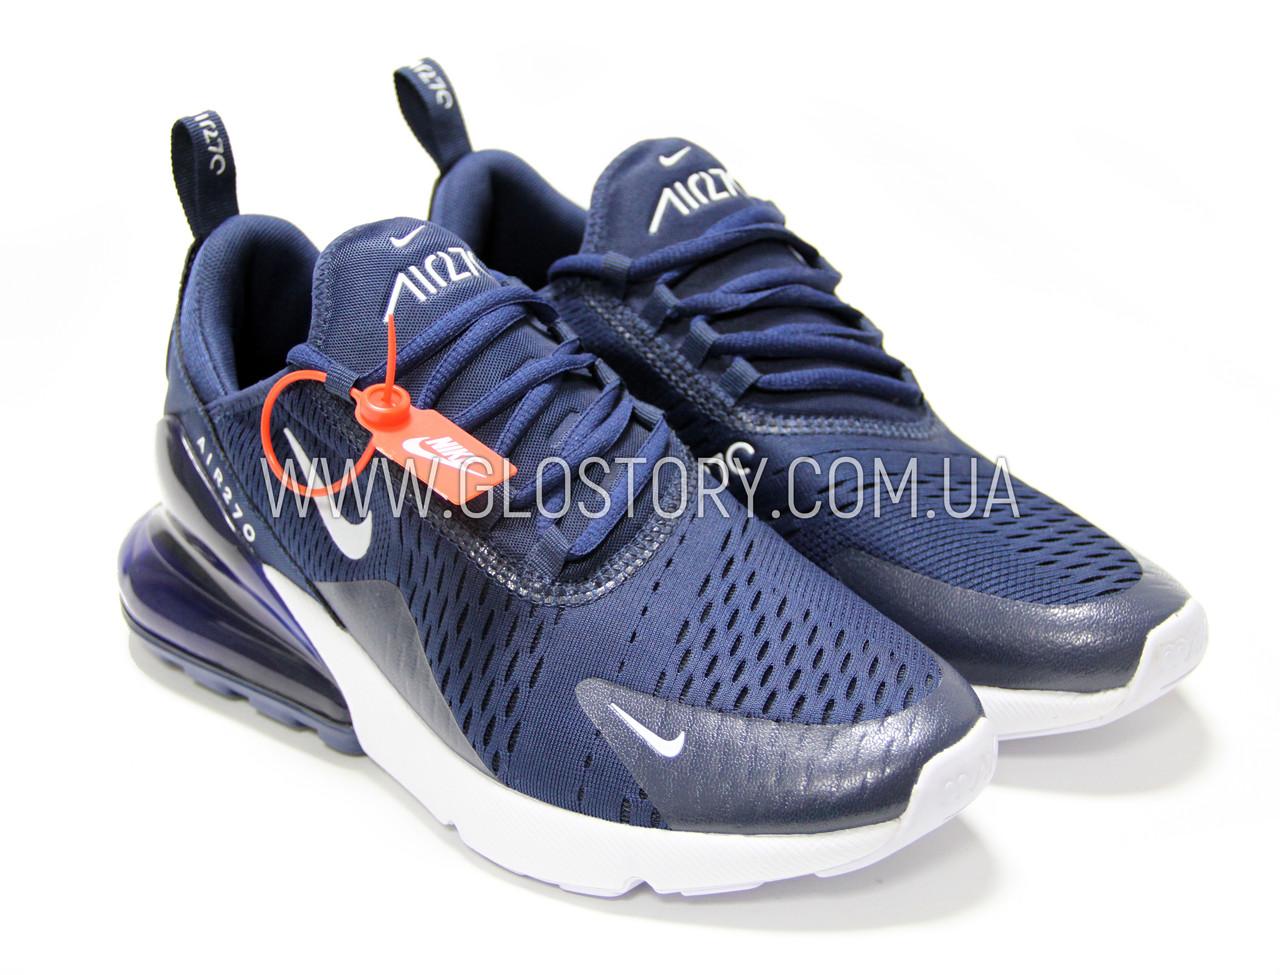 029c05b6 Кроссовки Nike Air Max 270 blue (Реплика),Бесплатная доставка - GLO-STORY